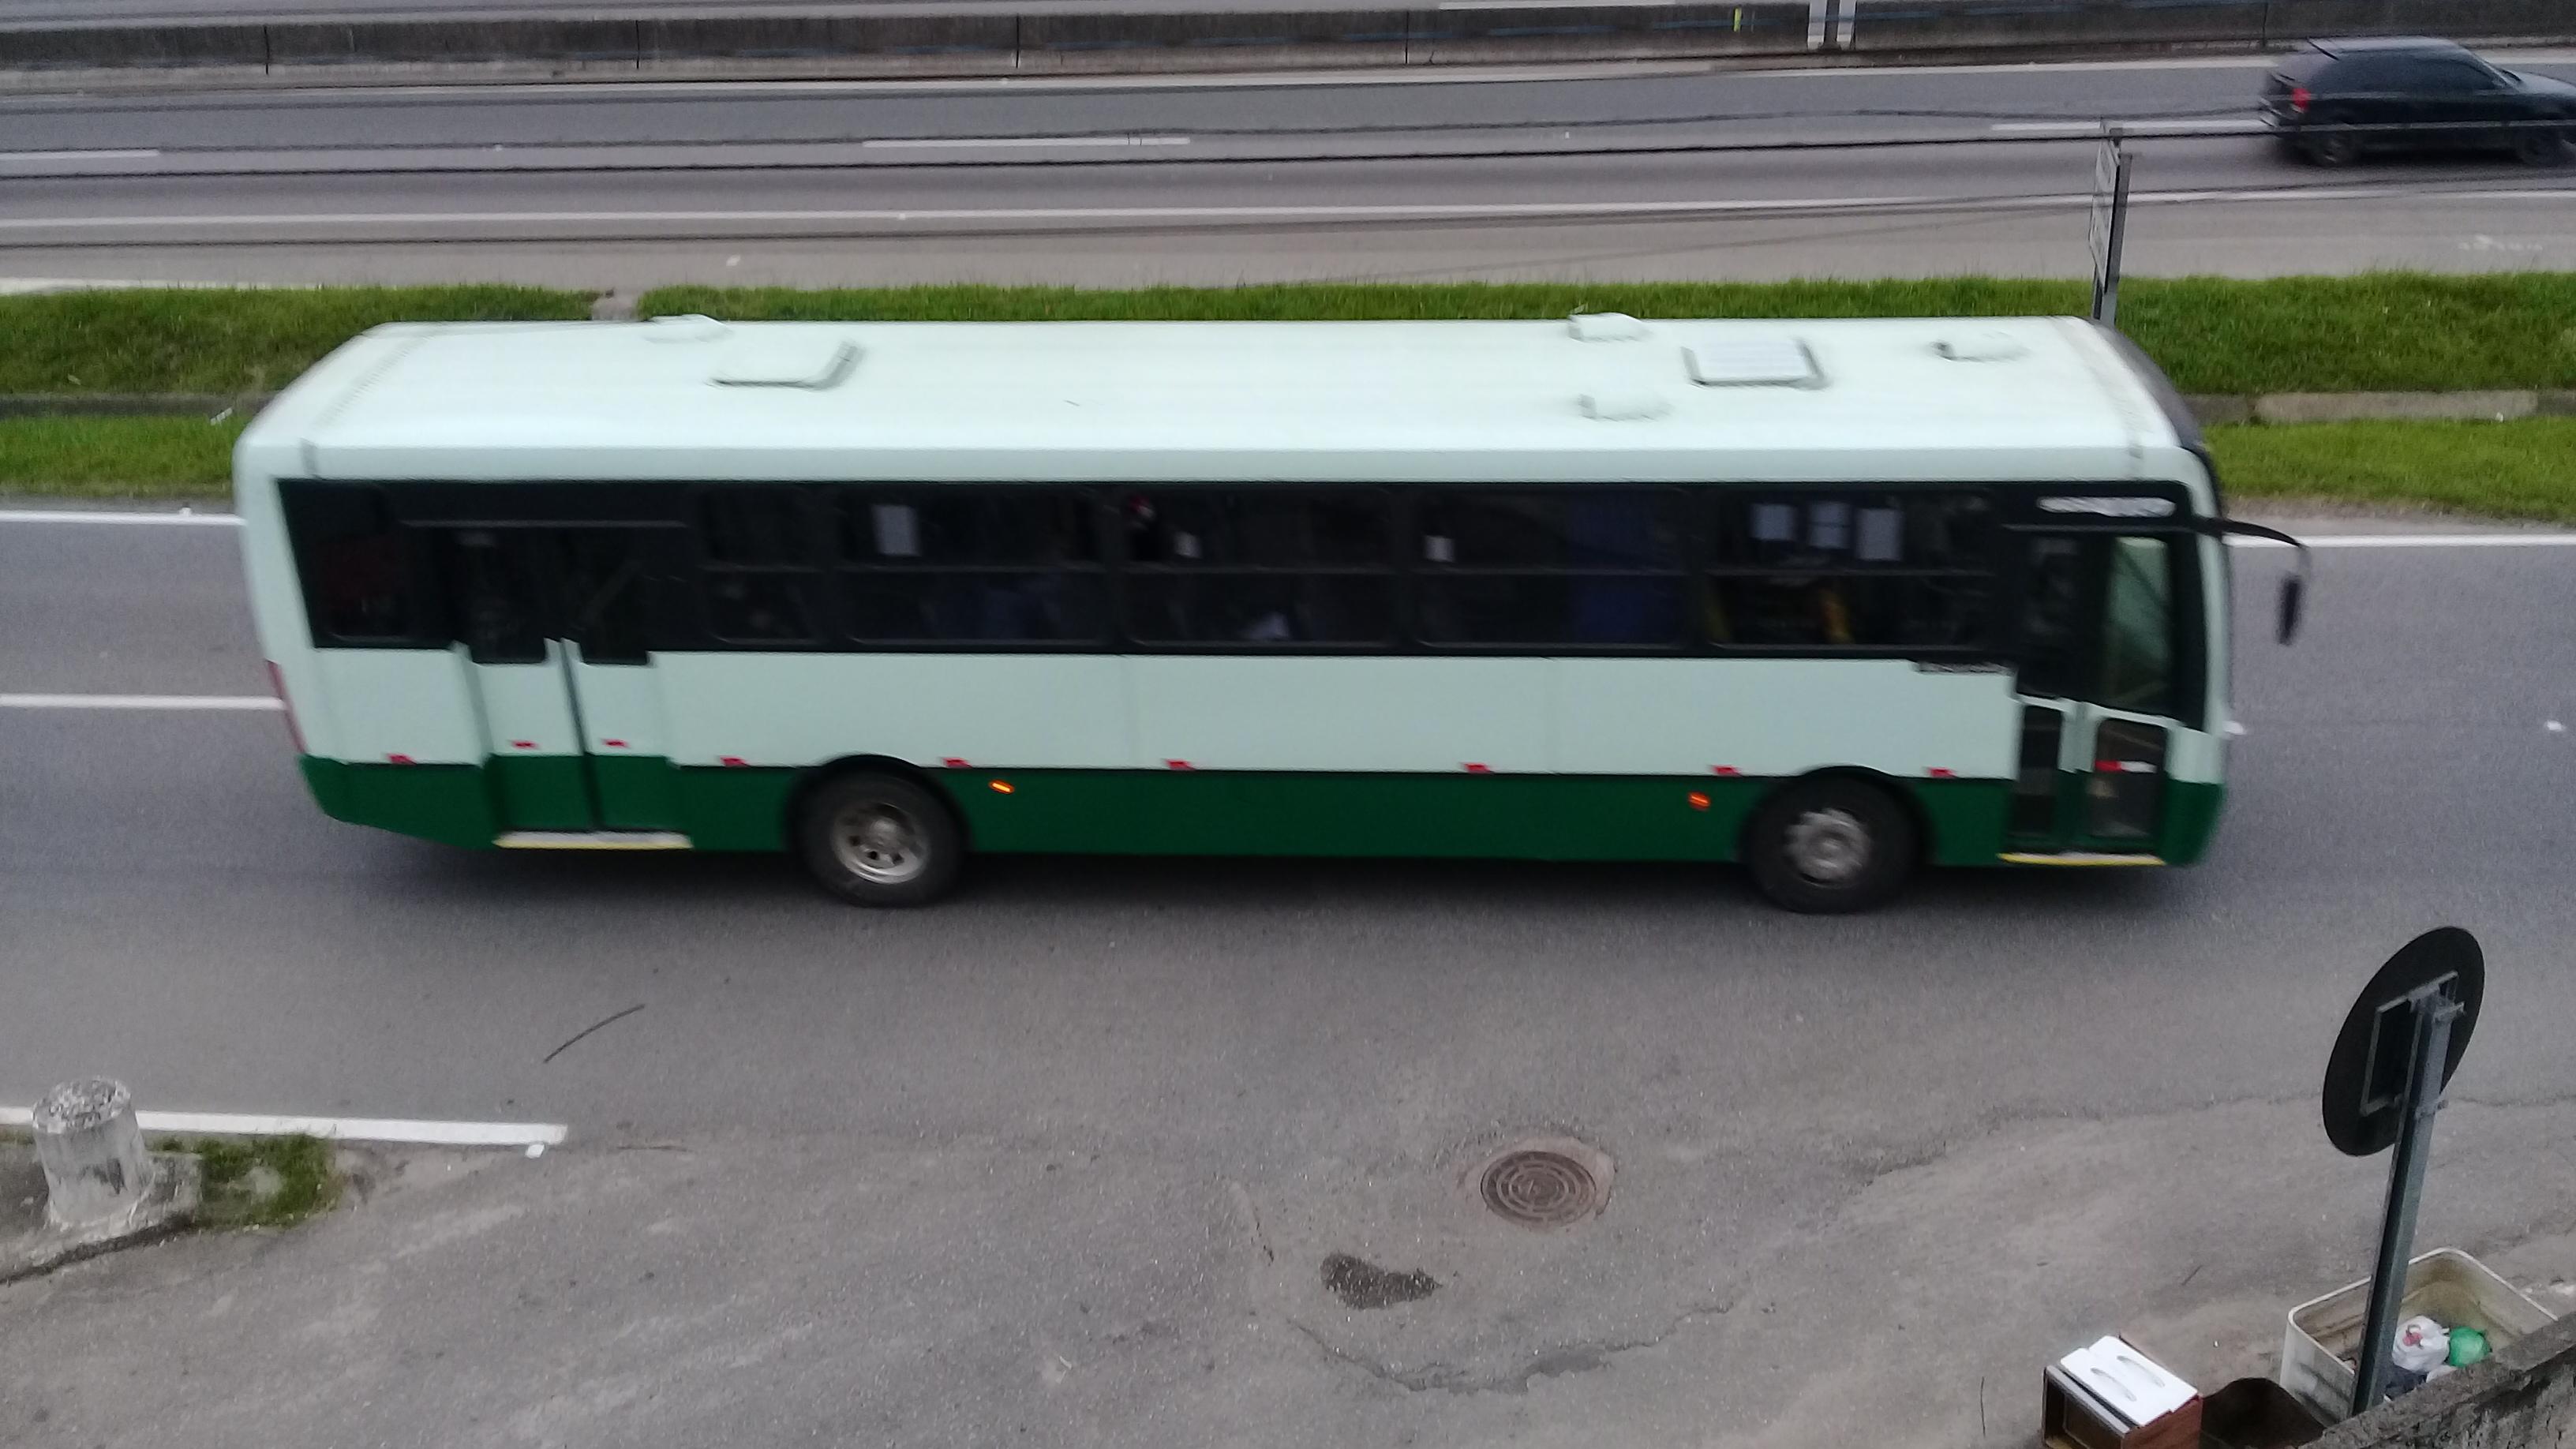 Jotur-Auto-nibus-e-Turismo-Josefense-SC-1267-3.jpg